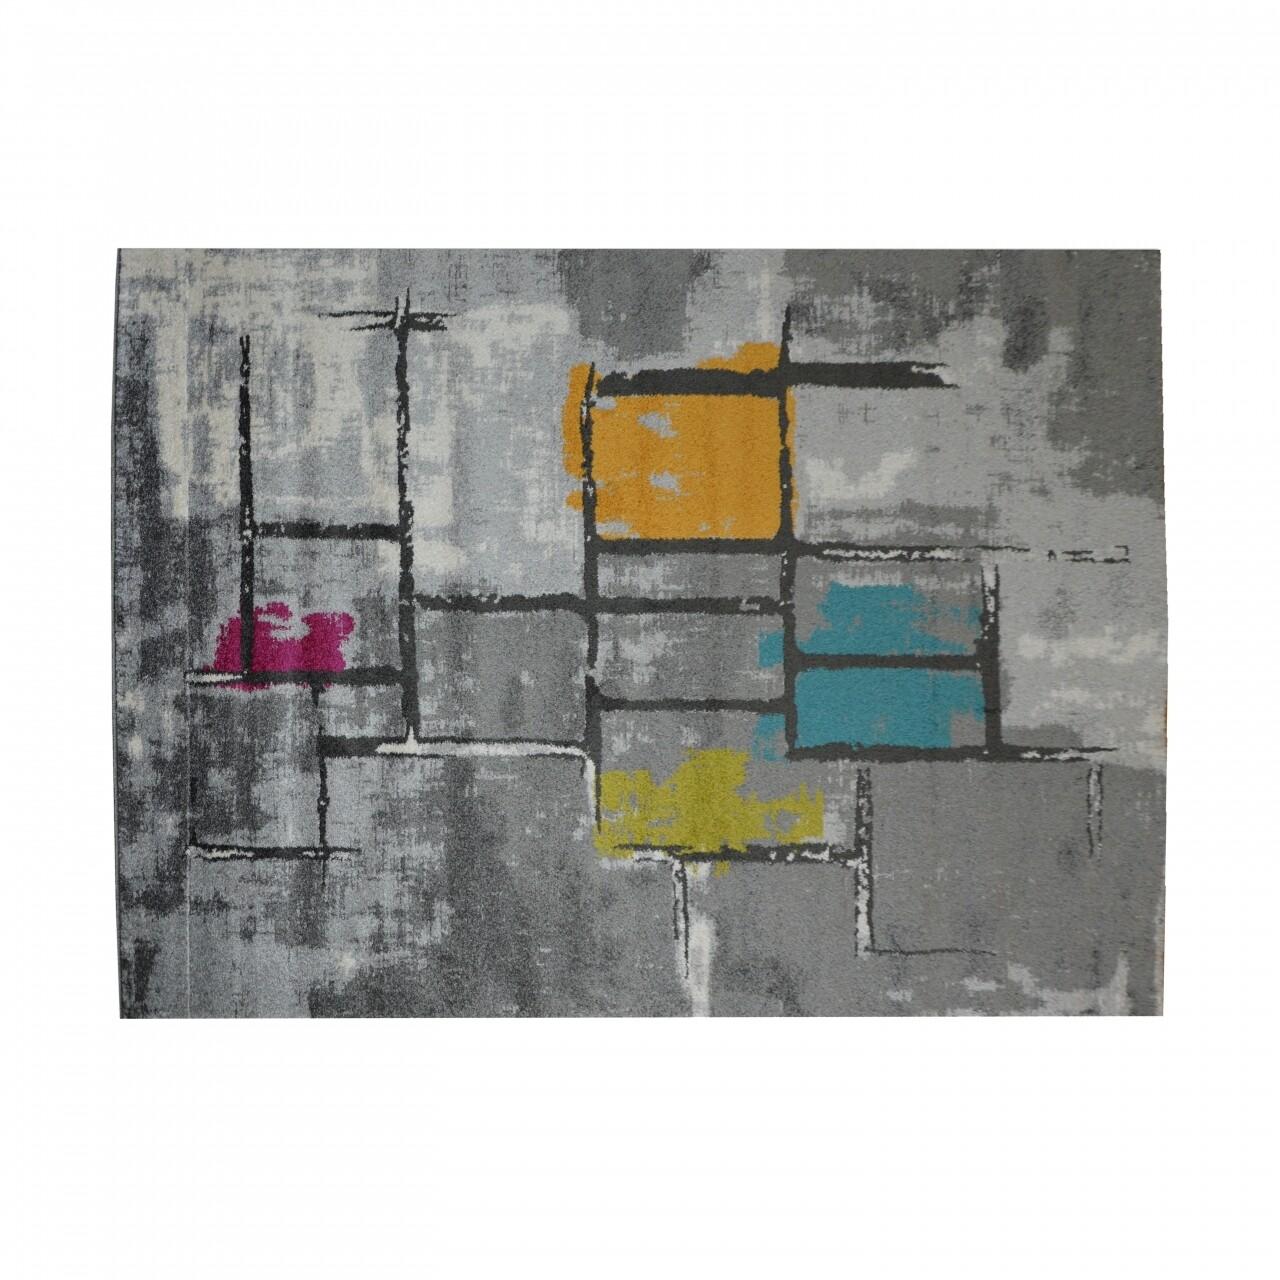 Covor Specter Graffiti Grey, Floorita, 160 x 230 cm, 100% polipropilena, gri